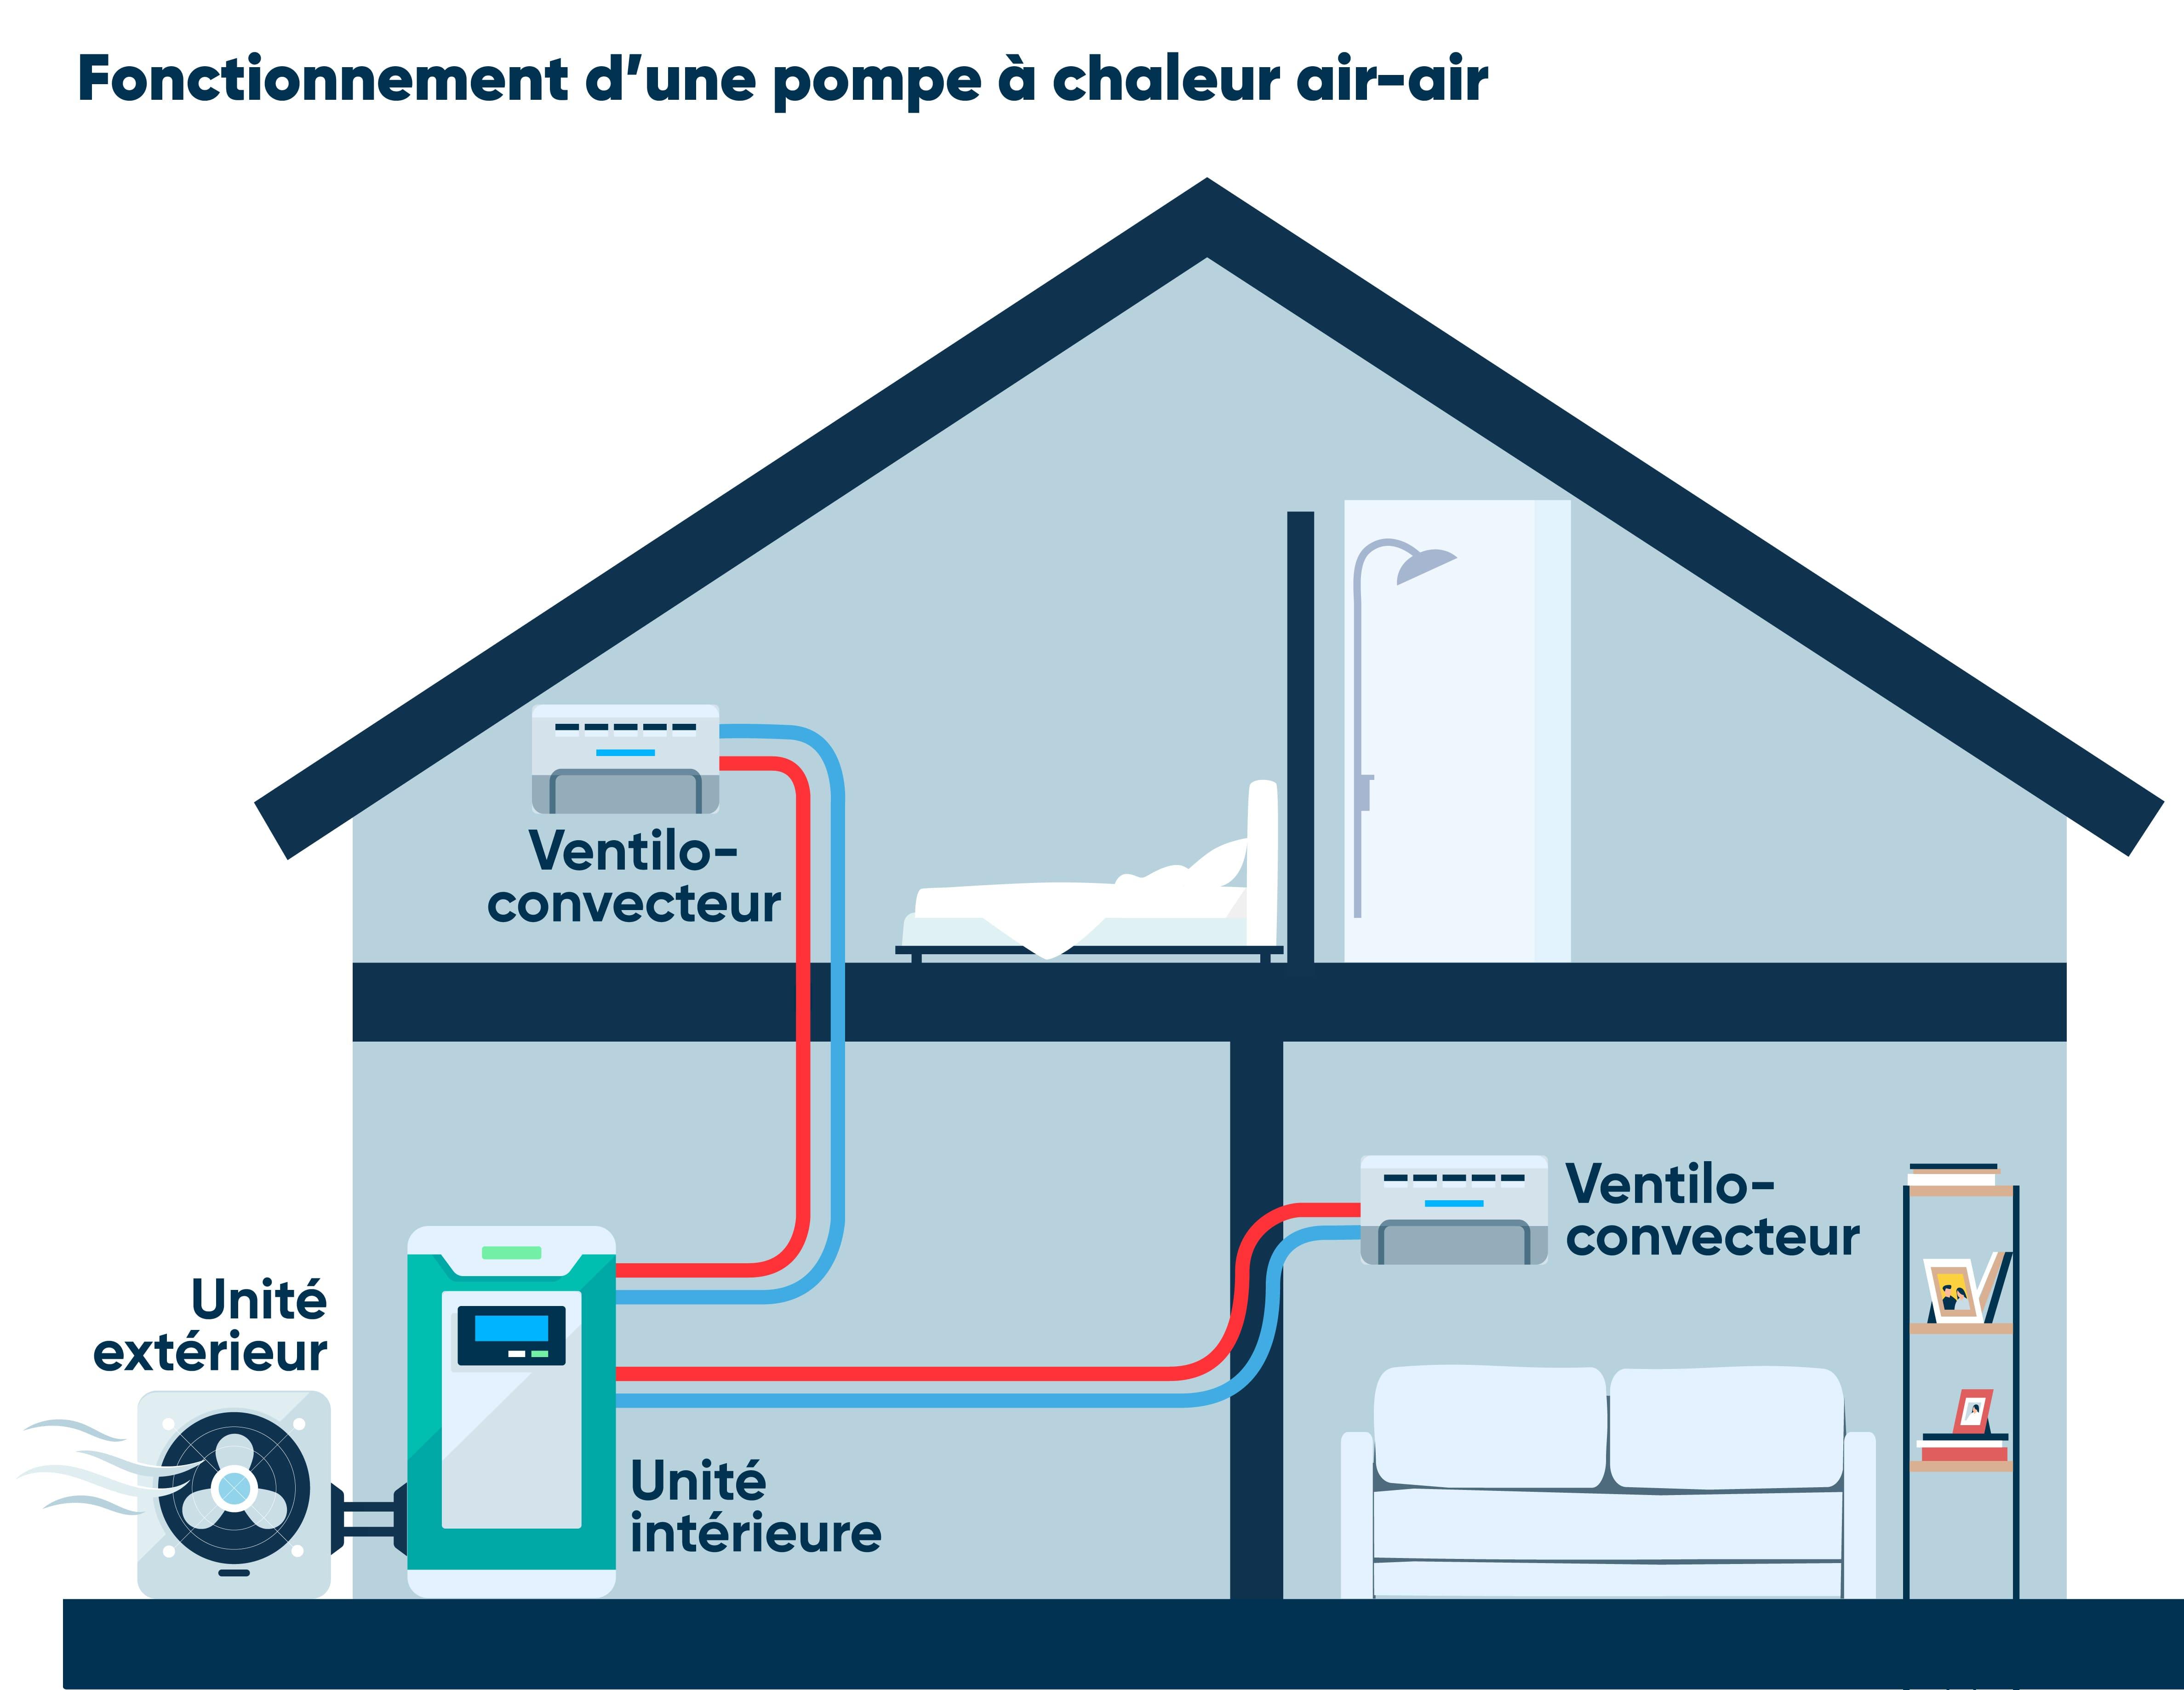 Schéma fonctionnement PAC air-air